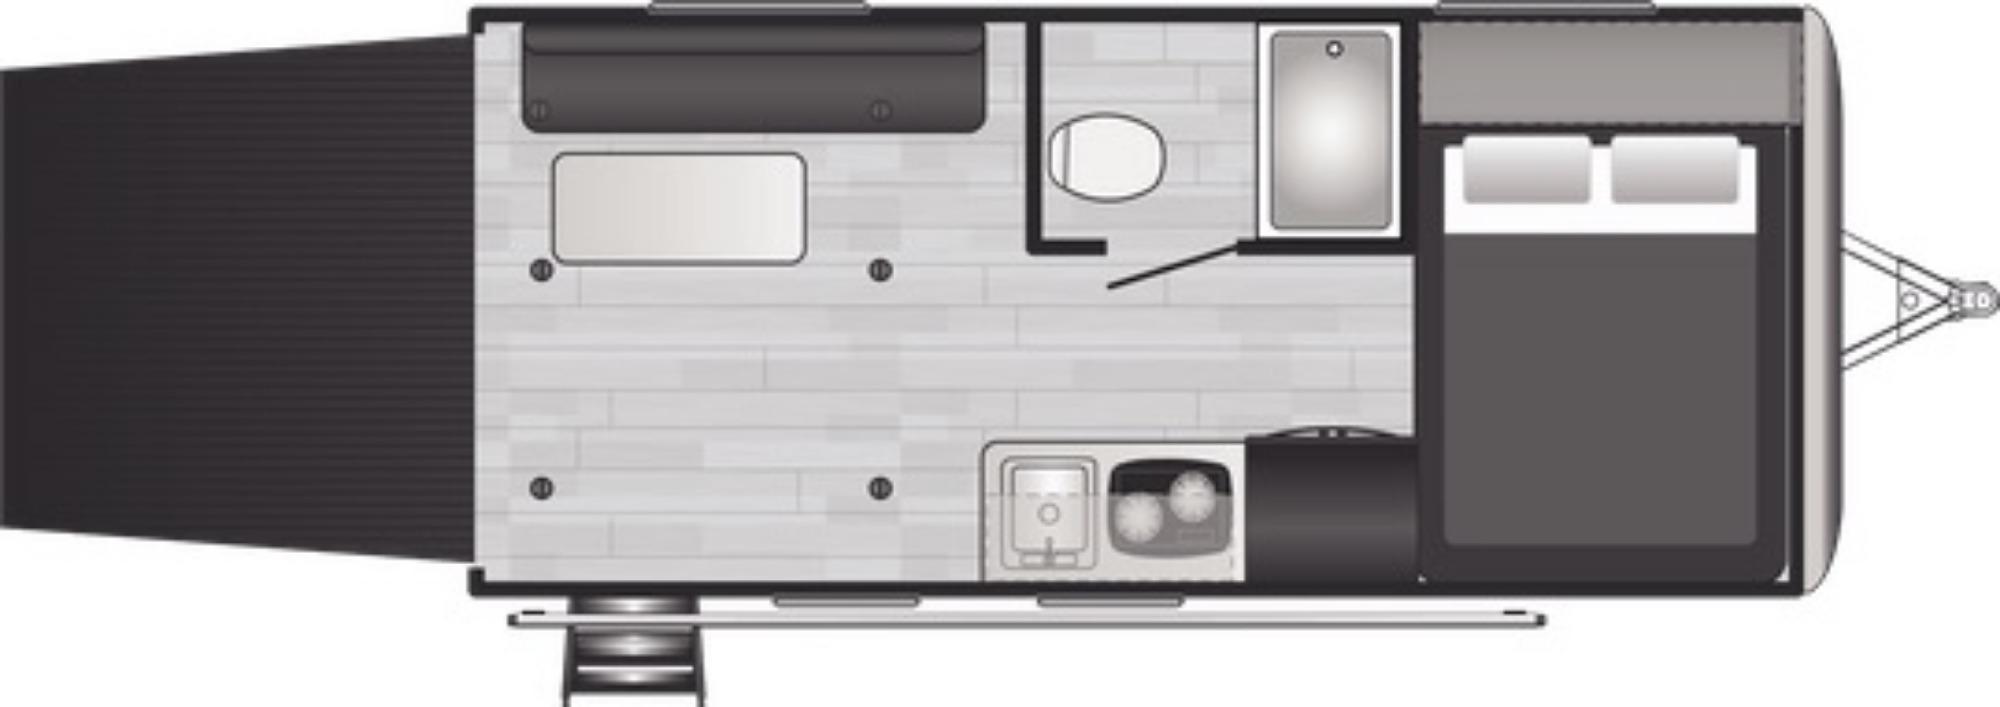 View Floor Plan for 2021 KEYSTONE SPRINGDALE 1720TH